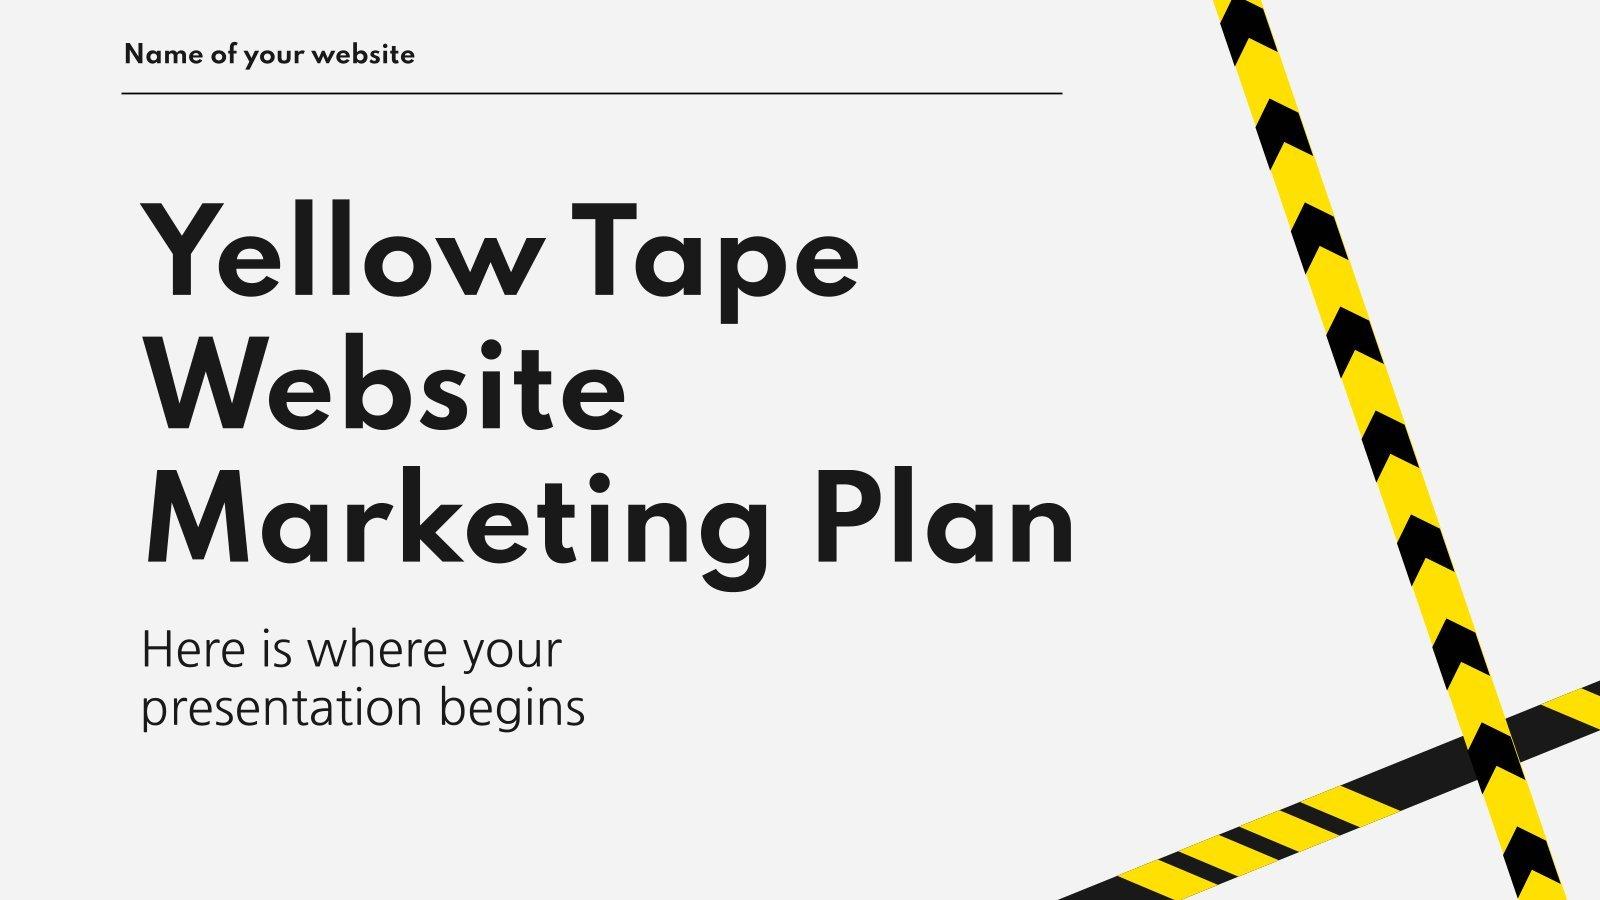 Yellow Tape Website MK Plan presentation template